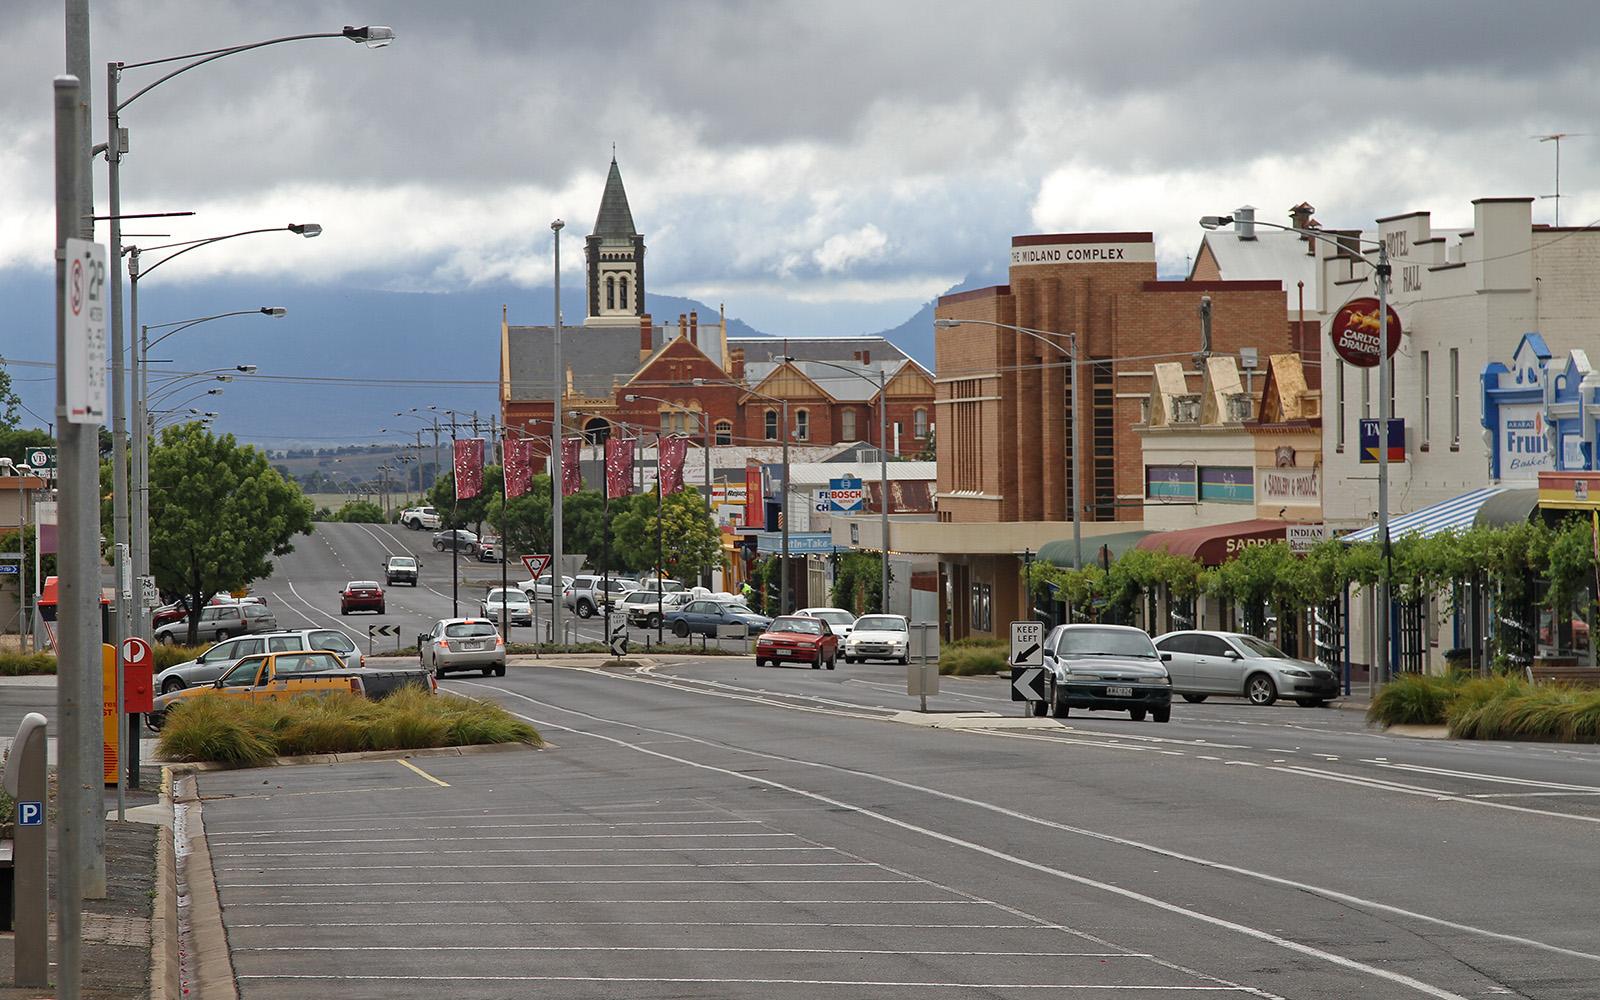 Ararat Australia  city photos : ararat victoria search for videos australian place city ararat vic